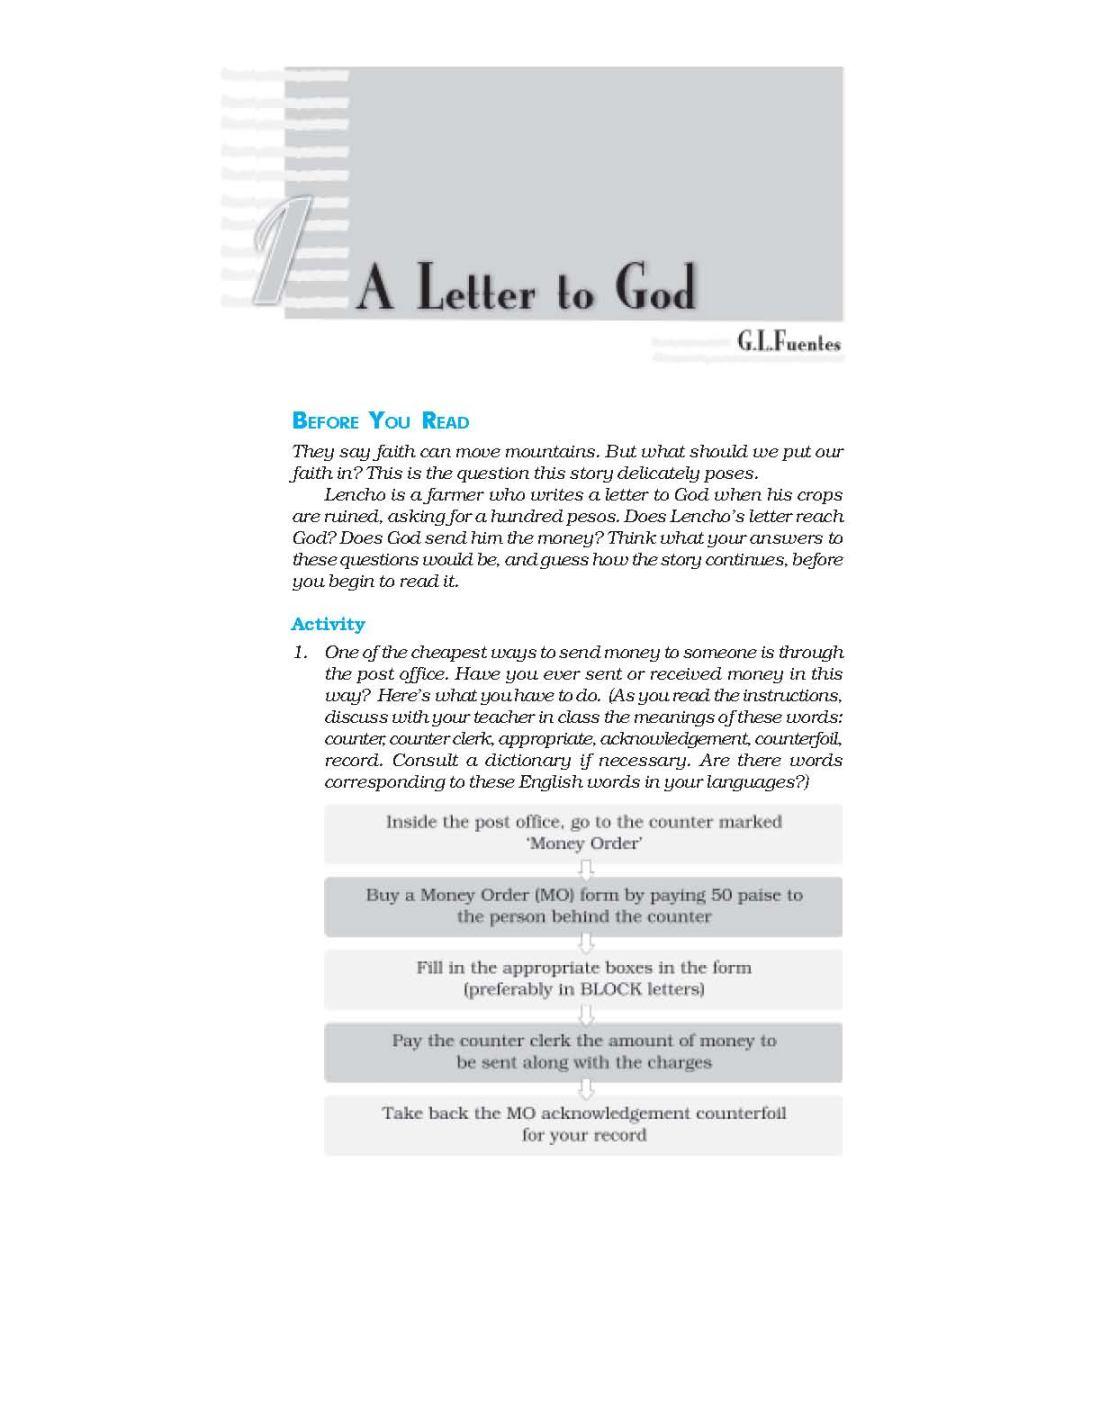 CBSE NCERT Books for Class 10th - 2018-2019 StudyChaCha